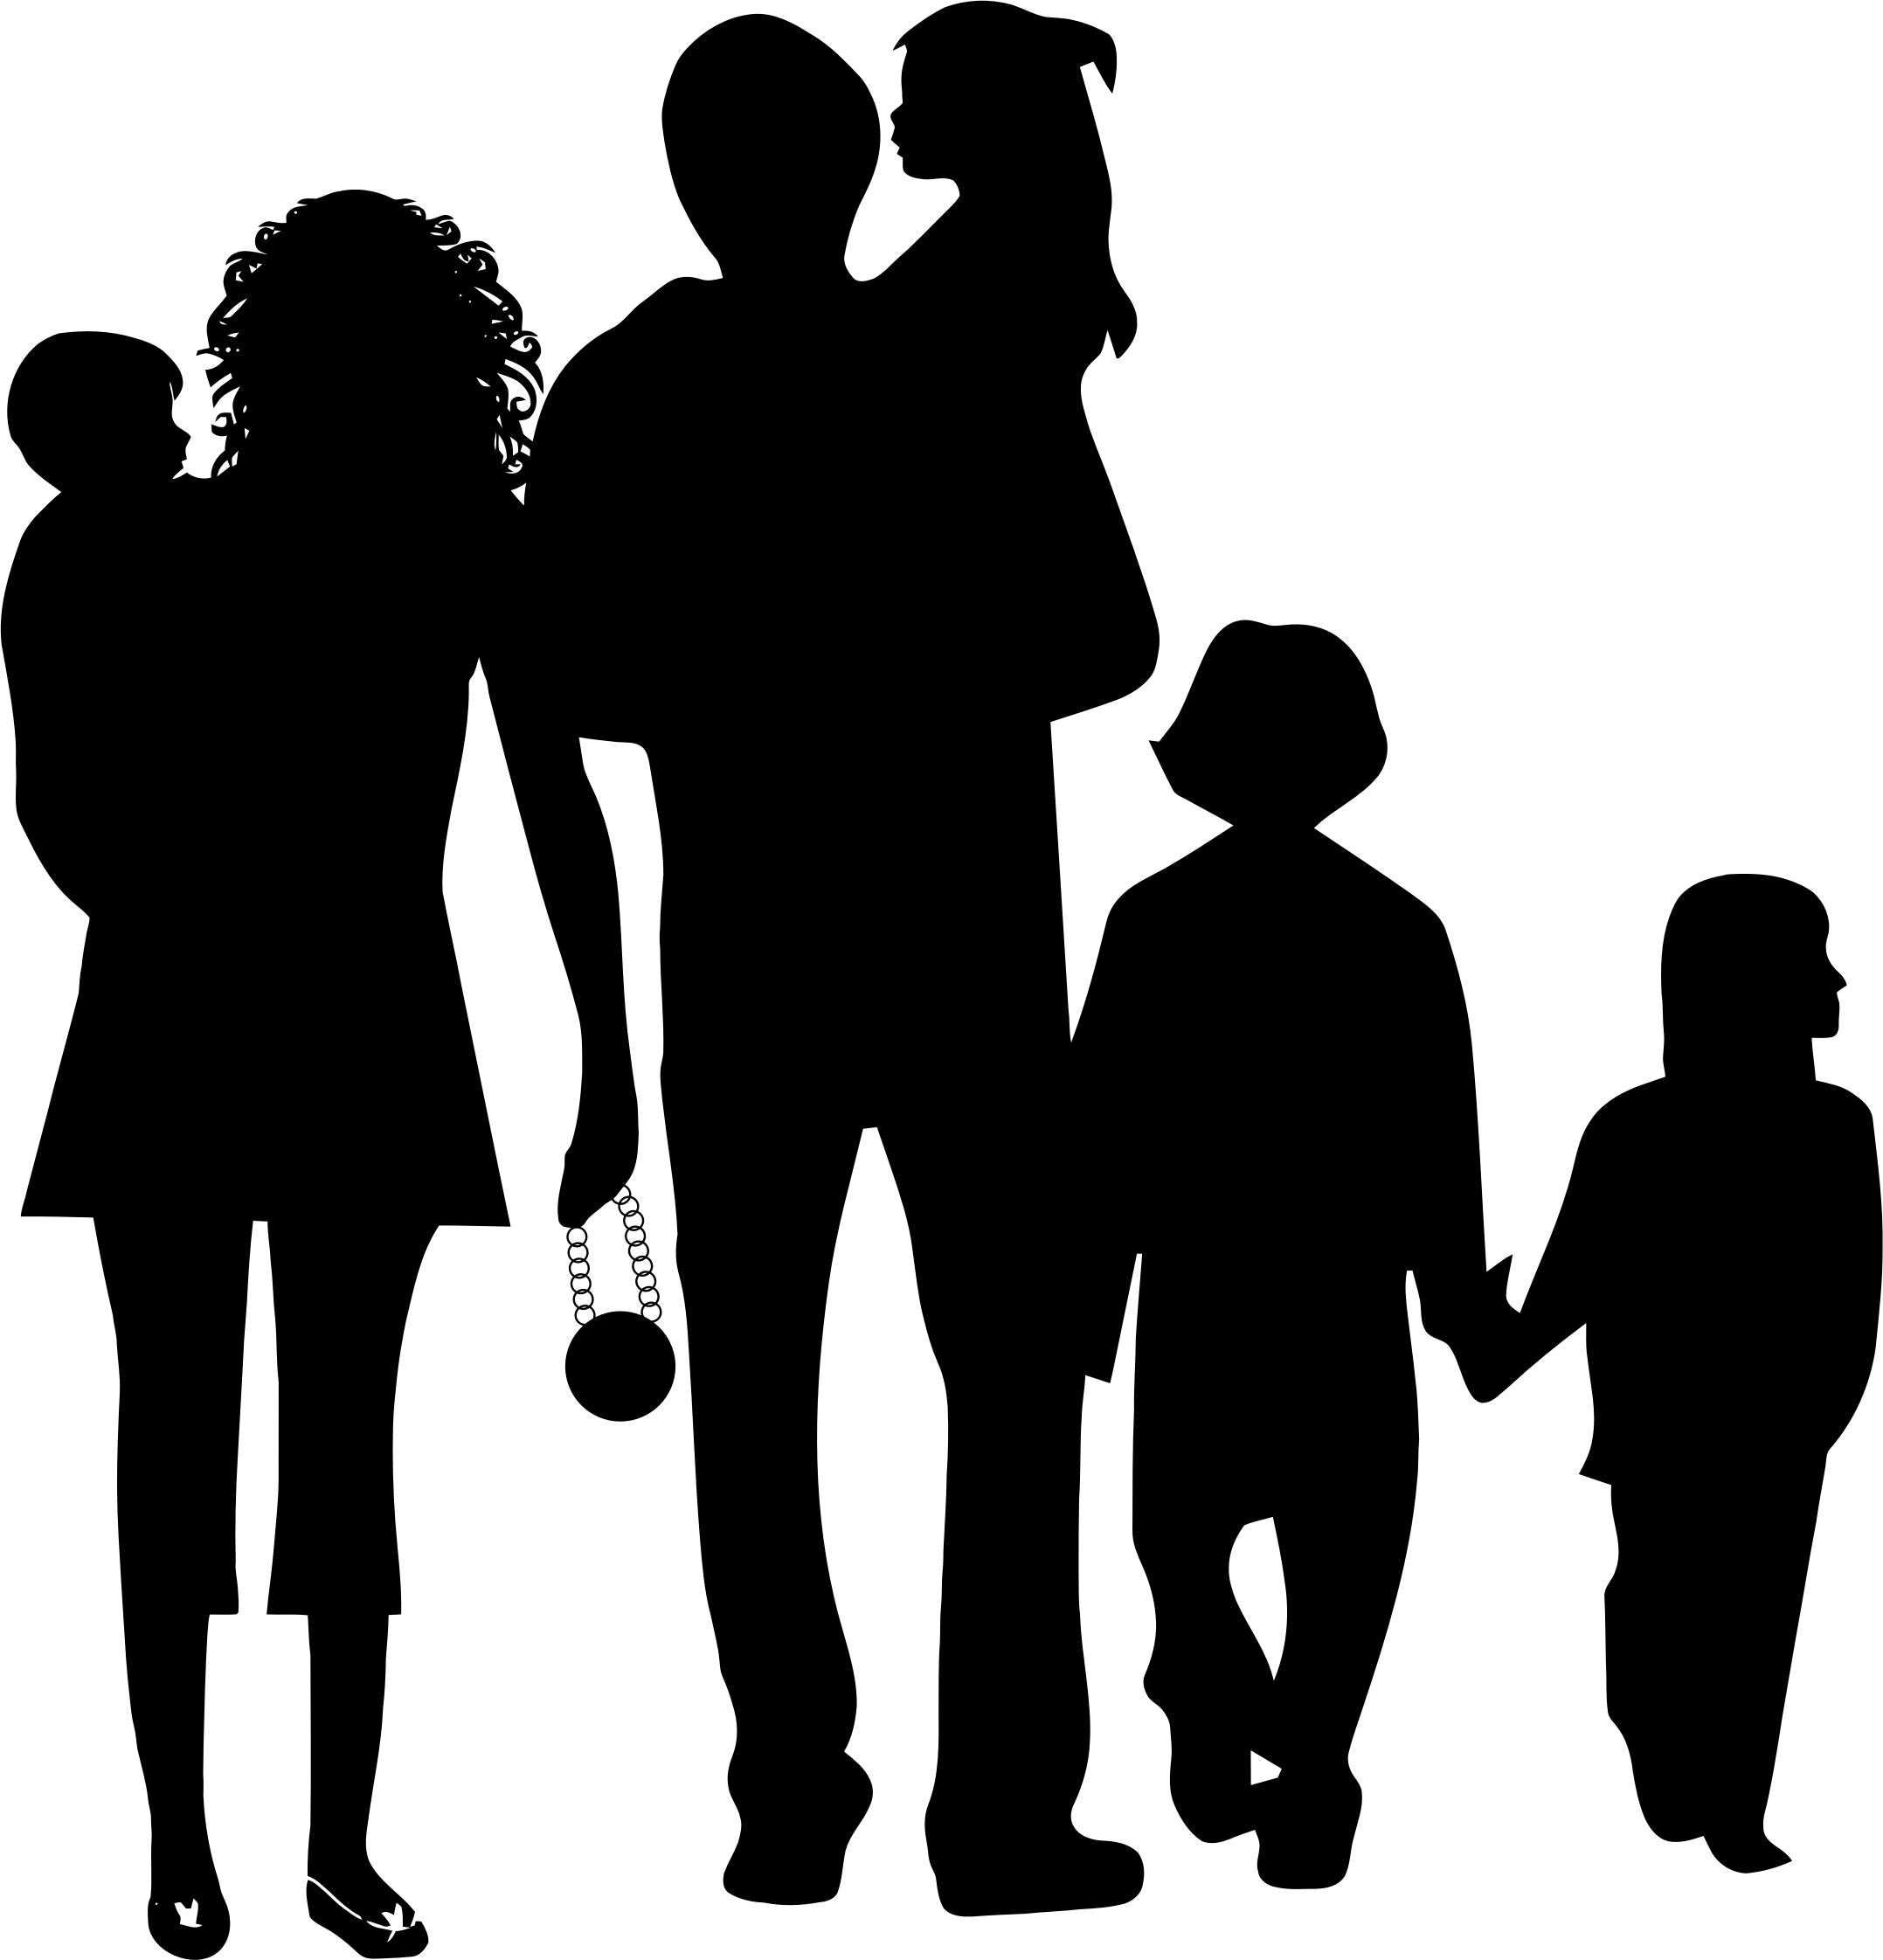 Community clipart silhouette, Community silhouette.